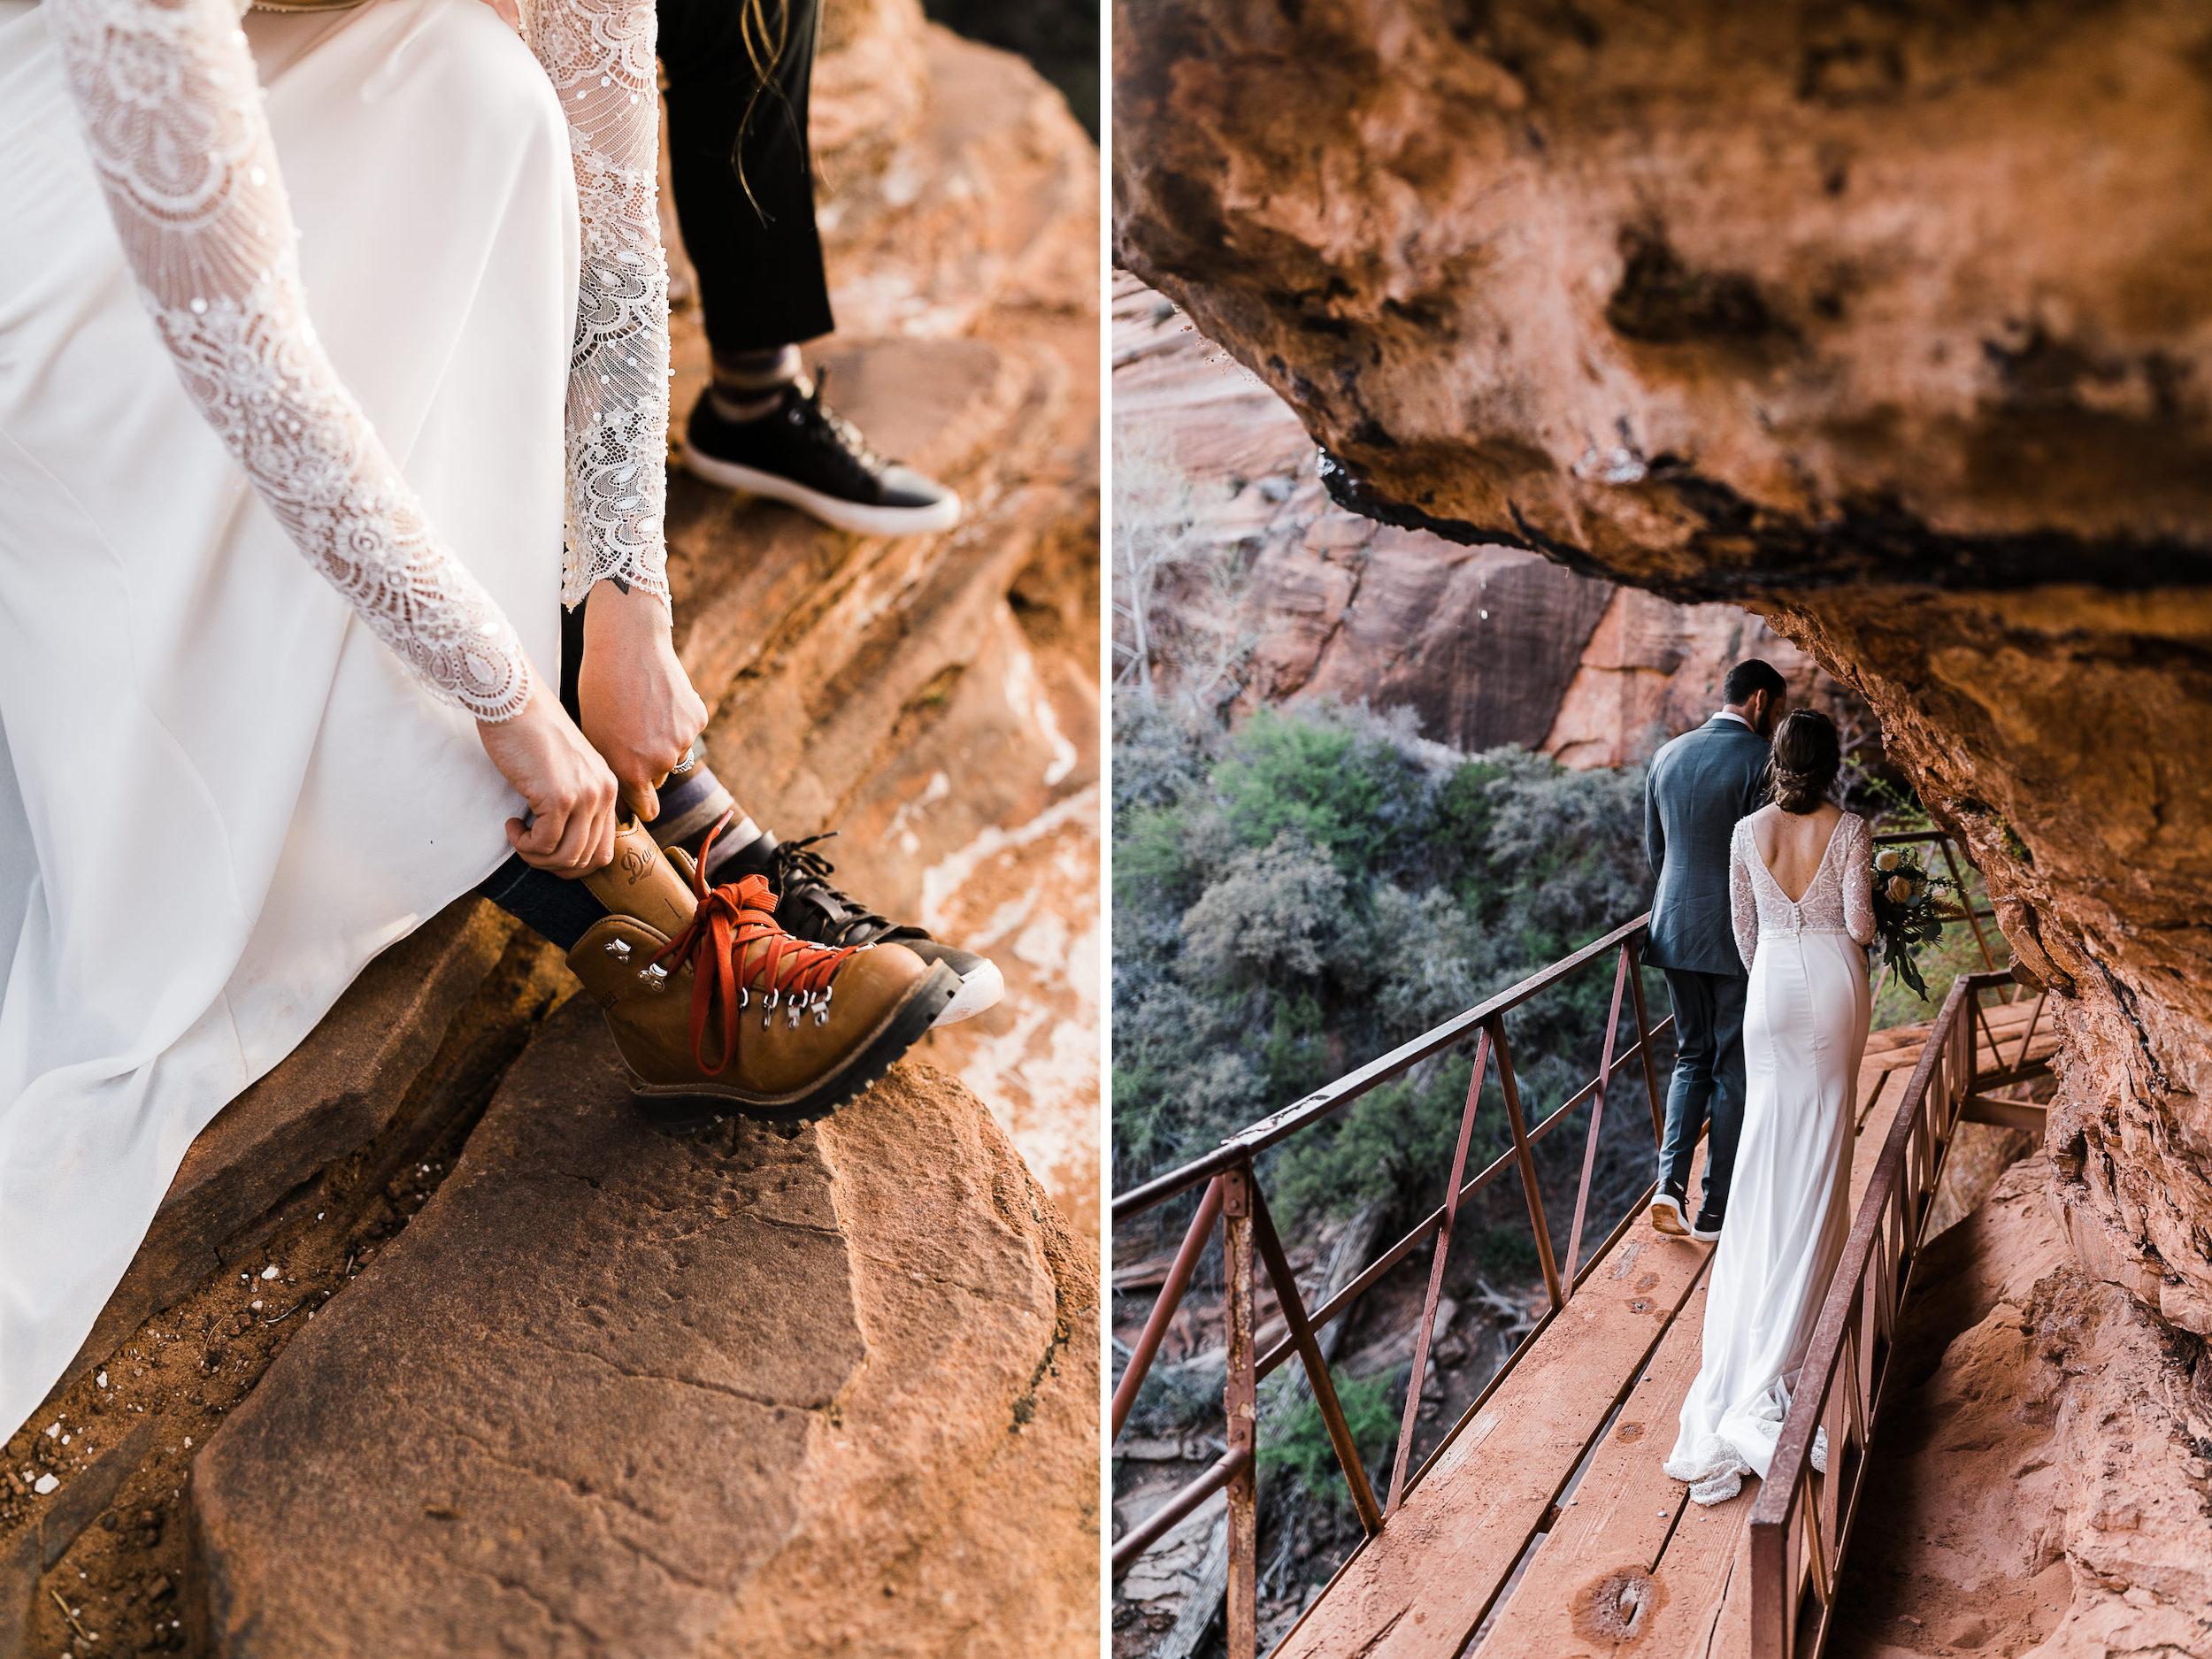 Zion-National-Park-Adventure-Wedding-Hearnes-Elopement-Photography-29.jpg